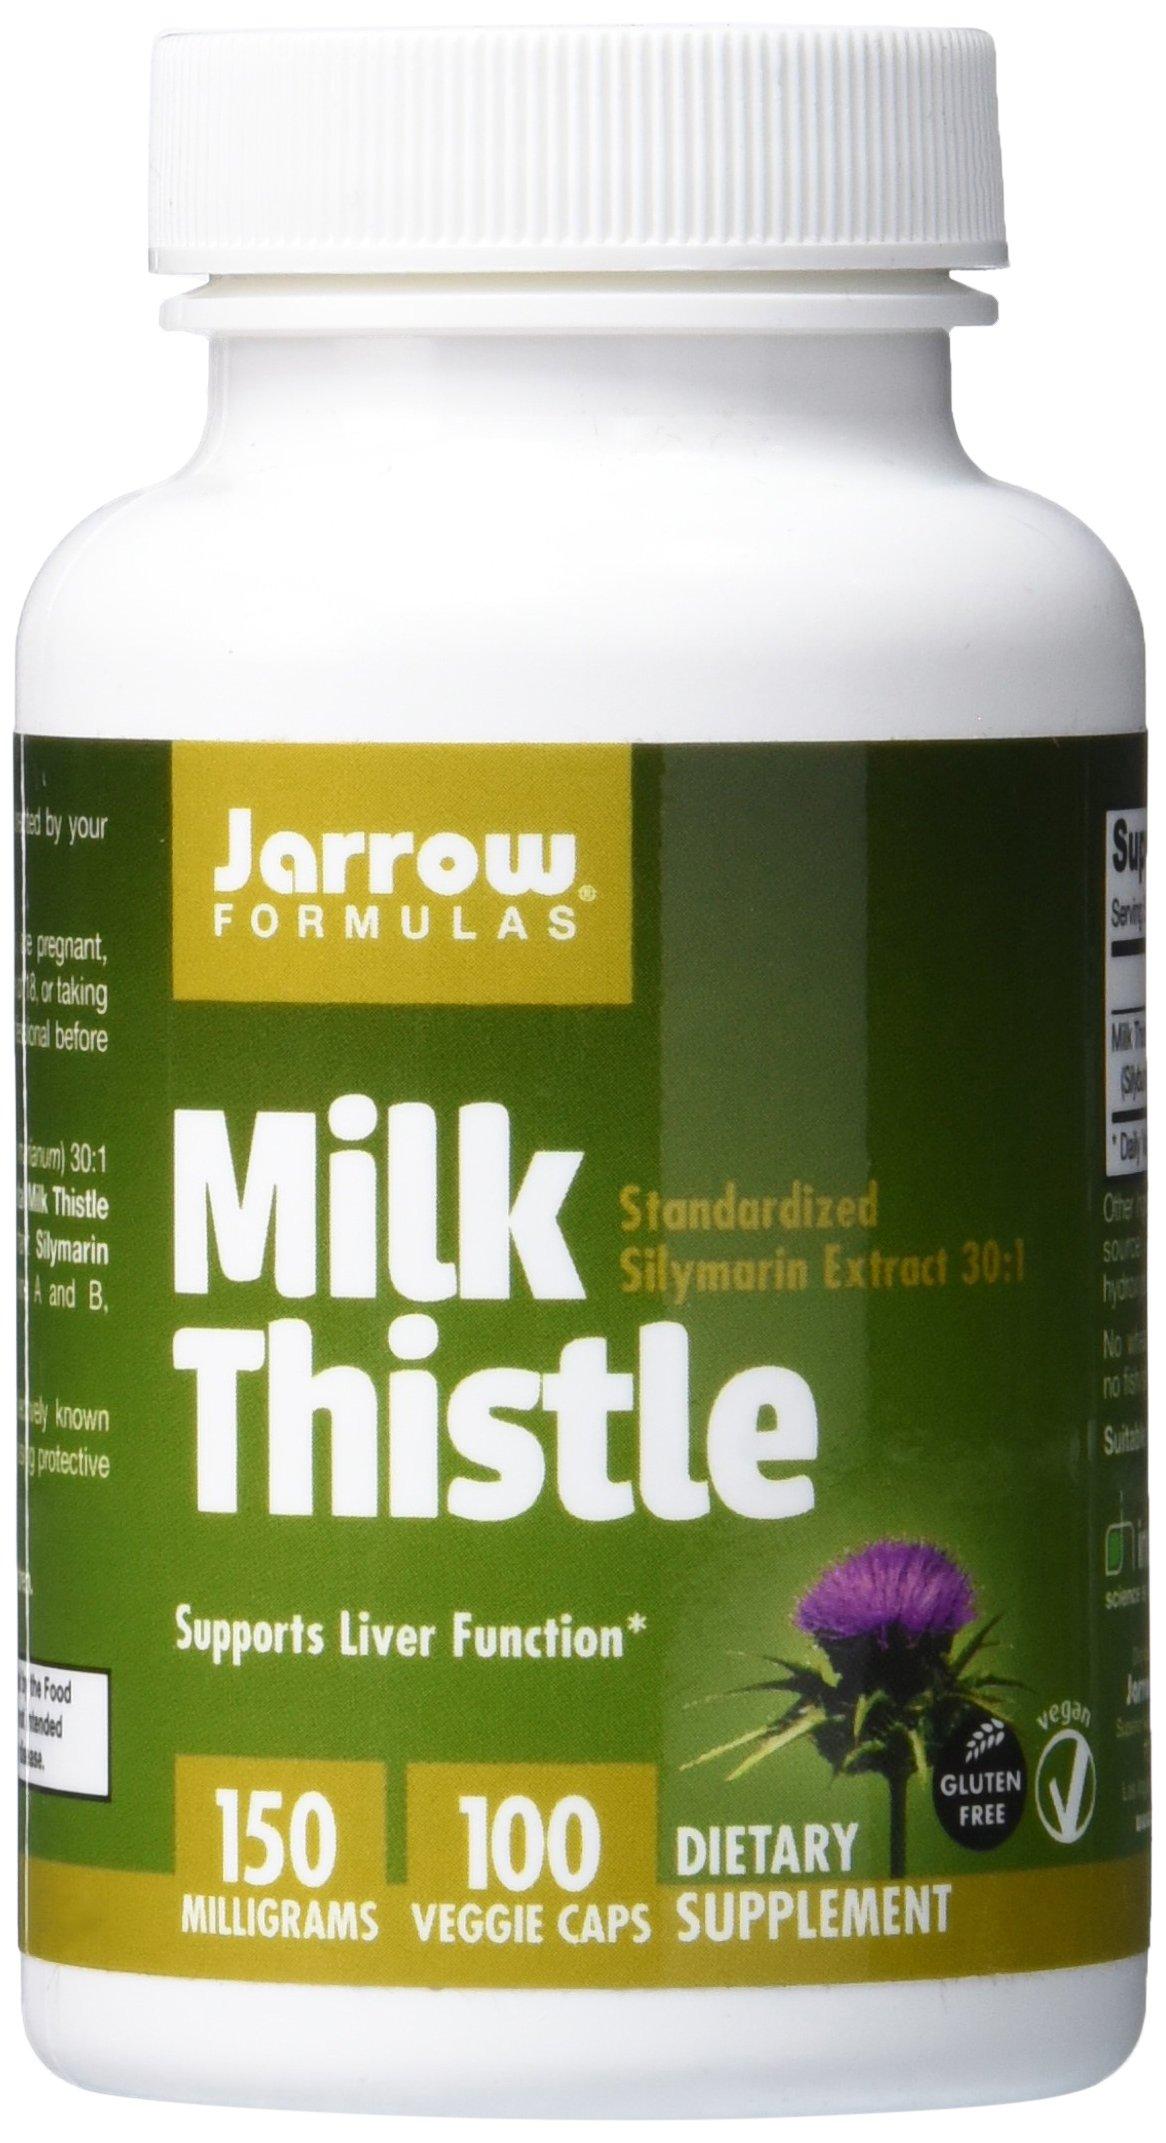 Jarrow Formulas Milk Thistle, Promotes Liver Health, 150 mg Caps, 100 Veggie Capsules